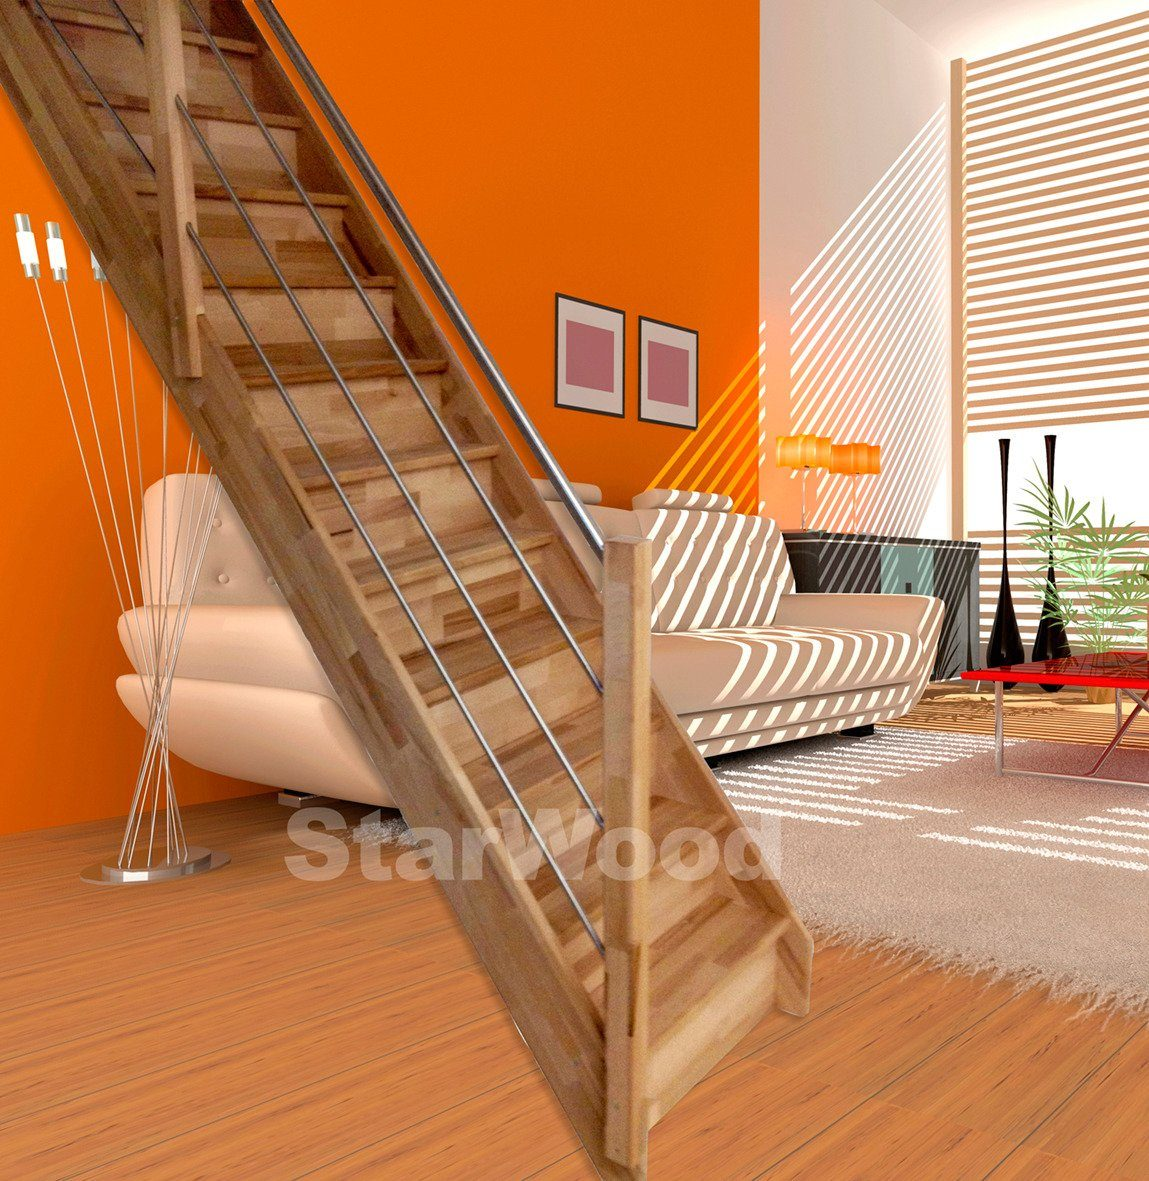 STARWOOD Raumspartreppe »Rhodos«, geschl. Stufen, gerade, Holz-Edelstahlgeländer links